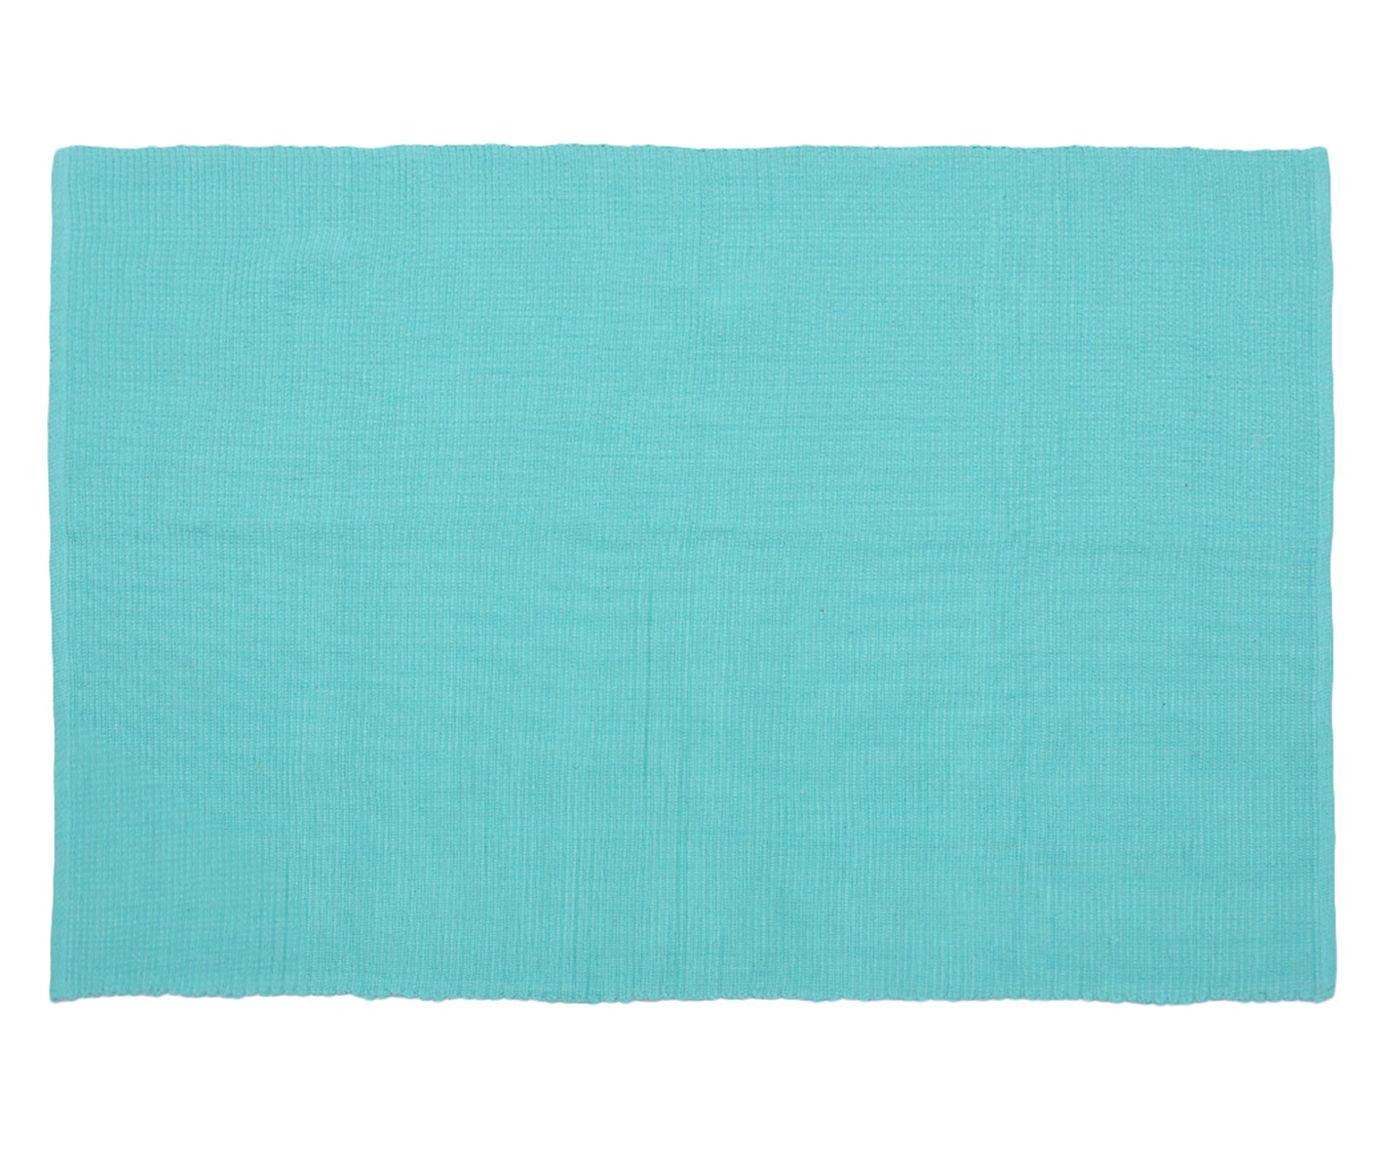 Tapete Indiano Mahavidya Turquesa - 120x180cm | Westwing.com.br